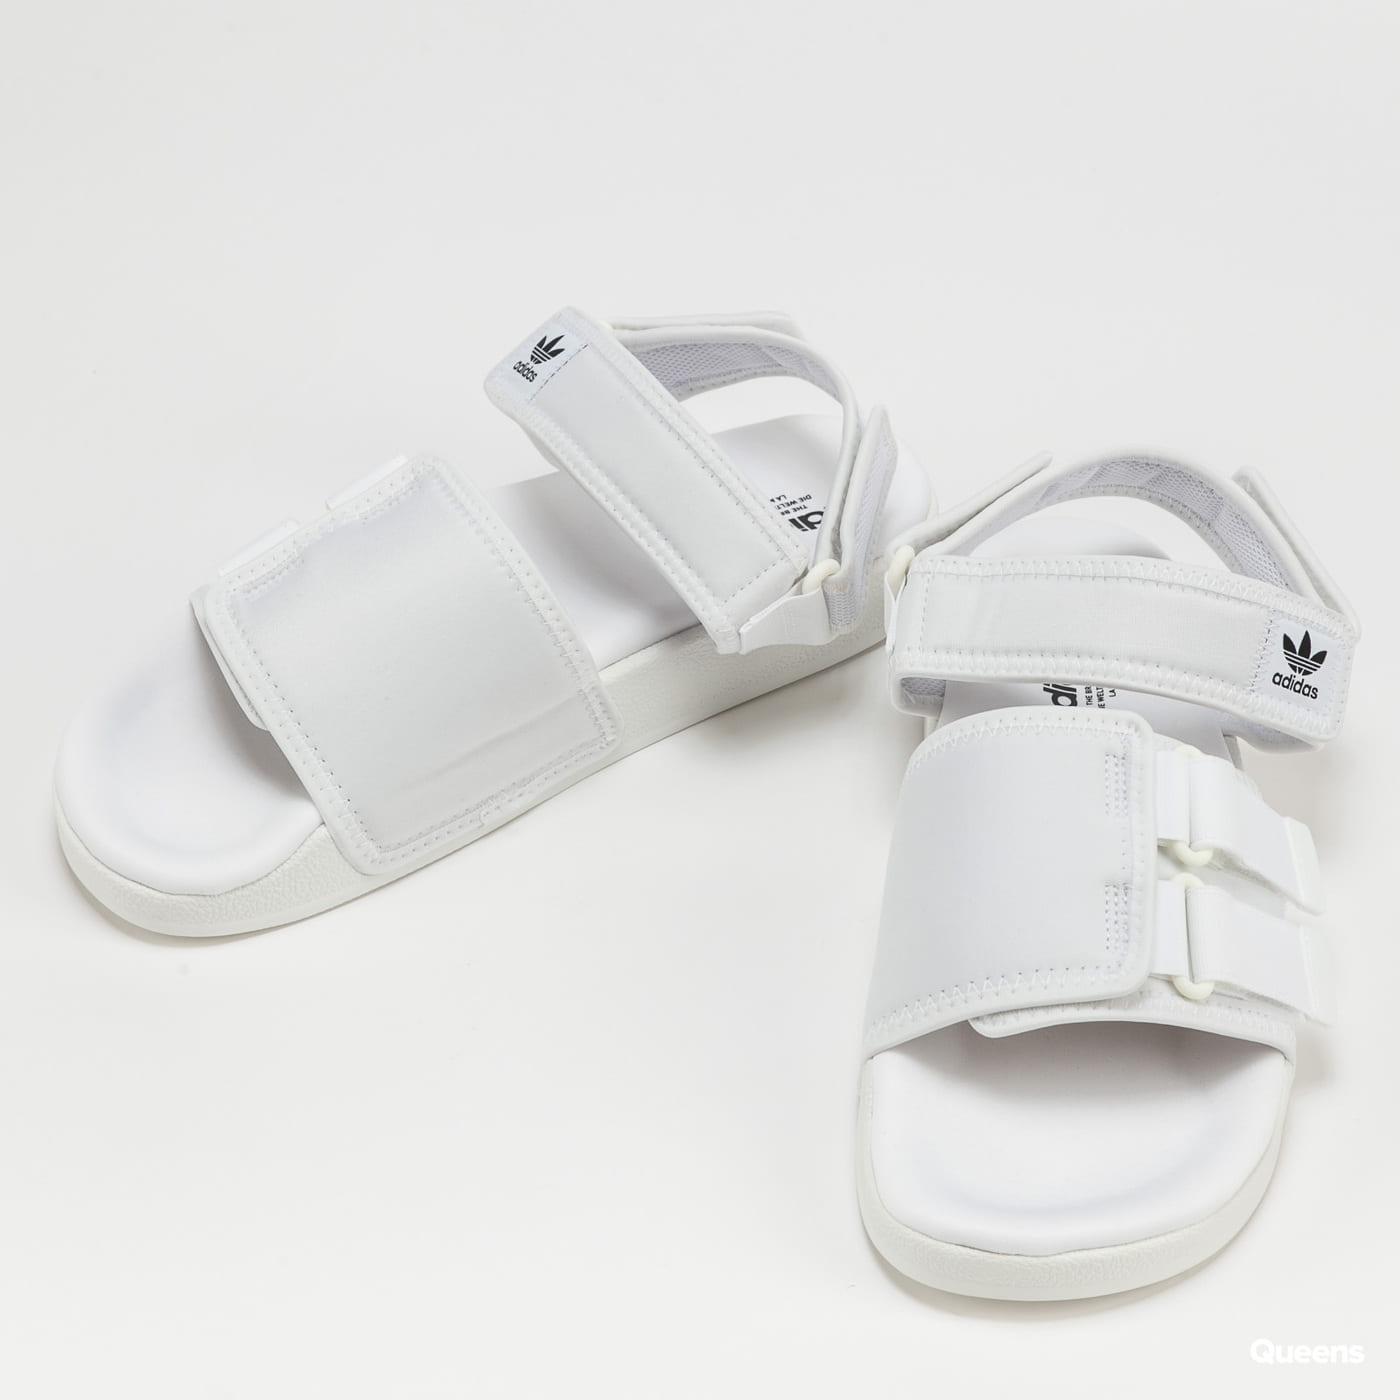 adidas Originals New Adilette Sandal 4.0 ftwwht / ftwwht / cblack